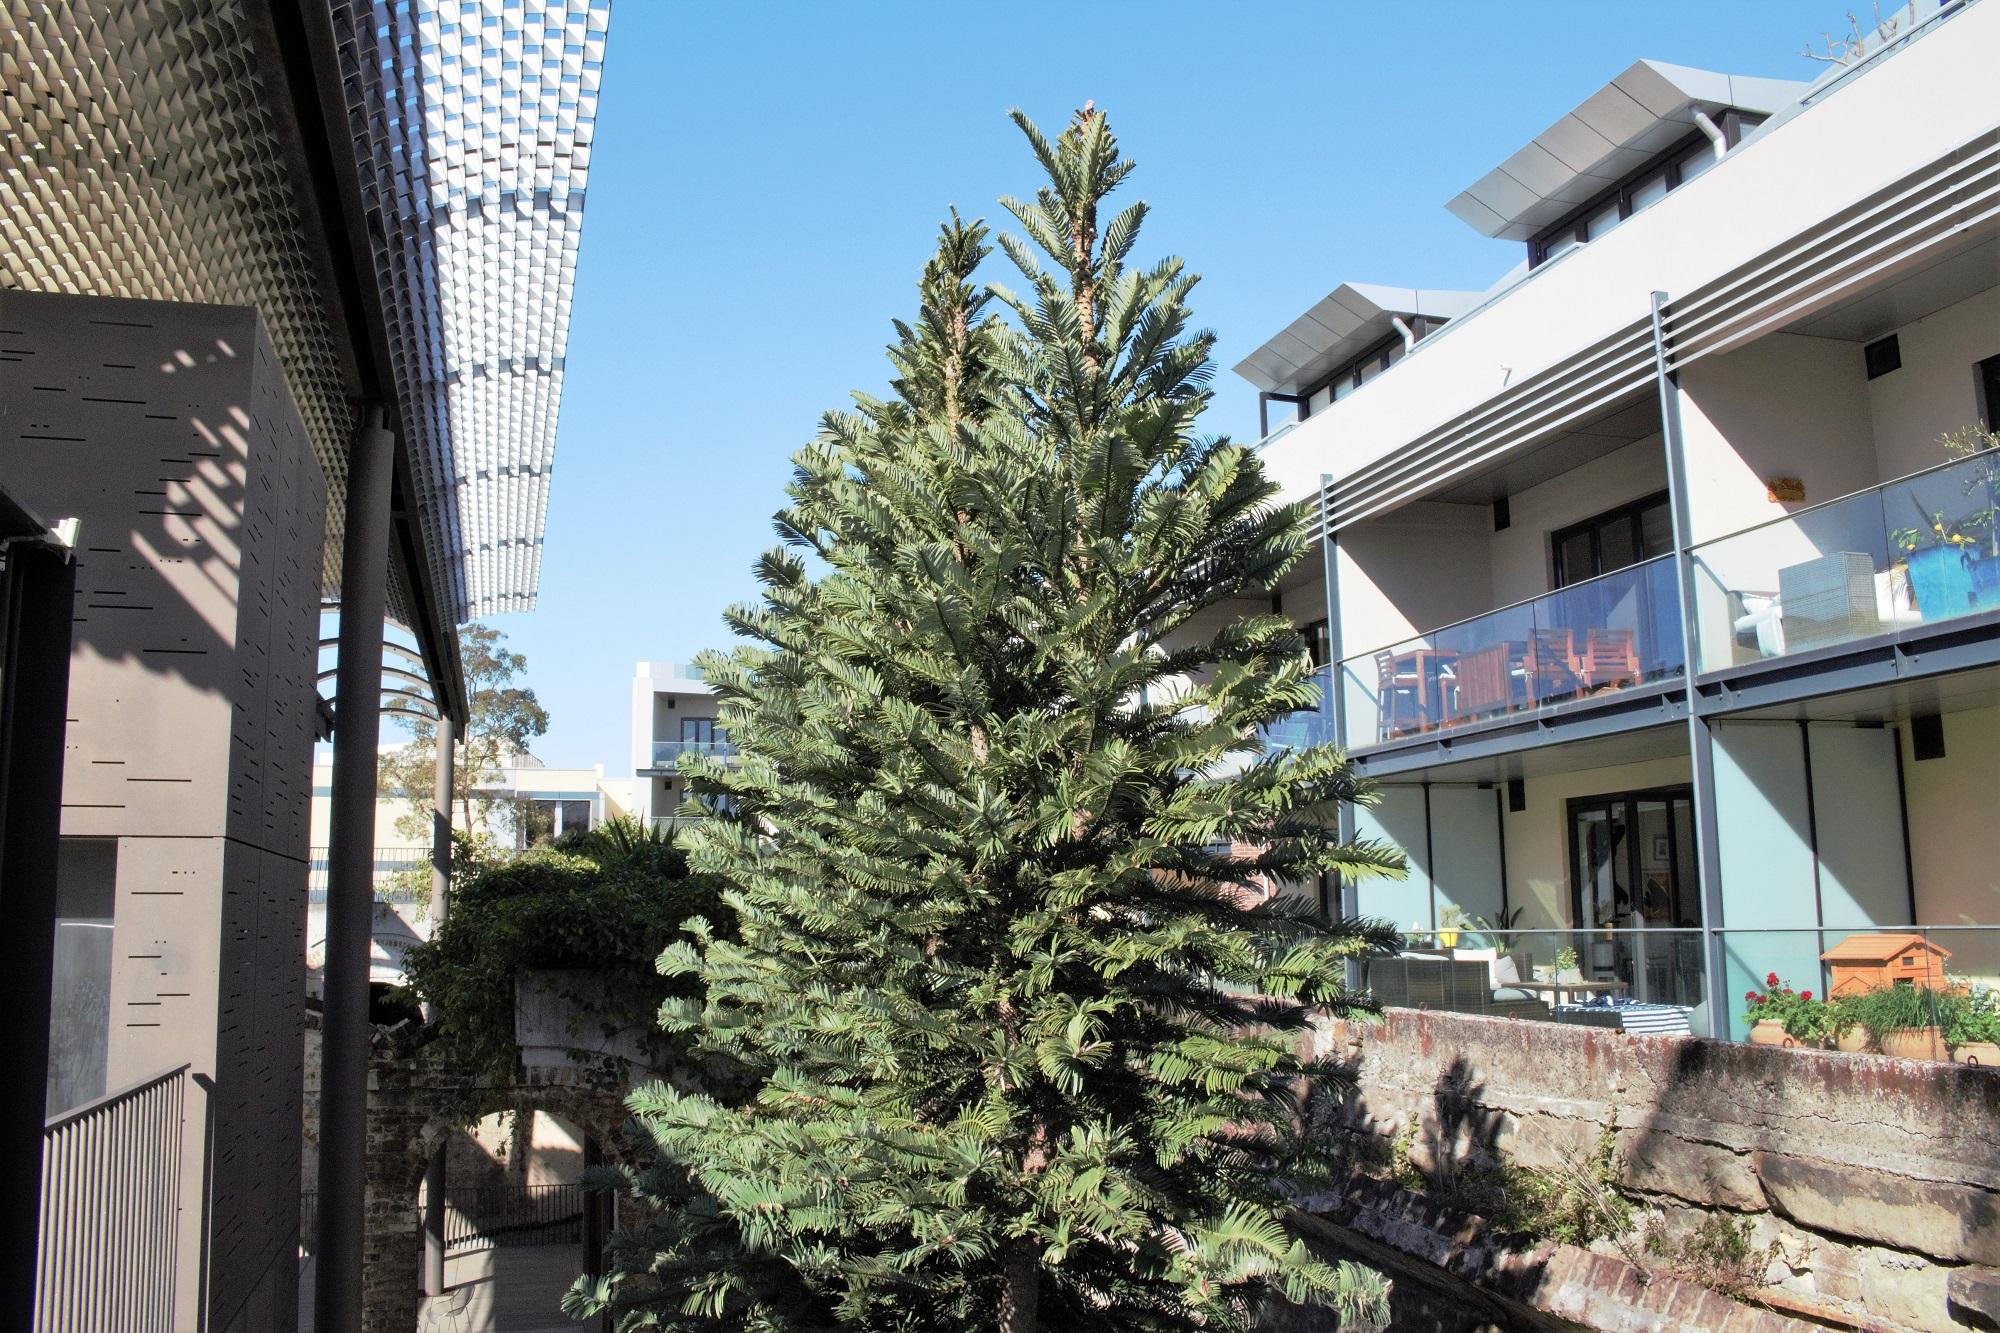 Sydney Wollemi Pine